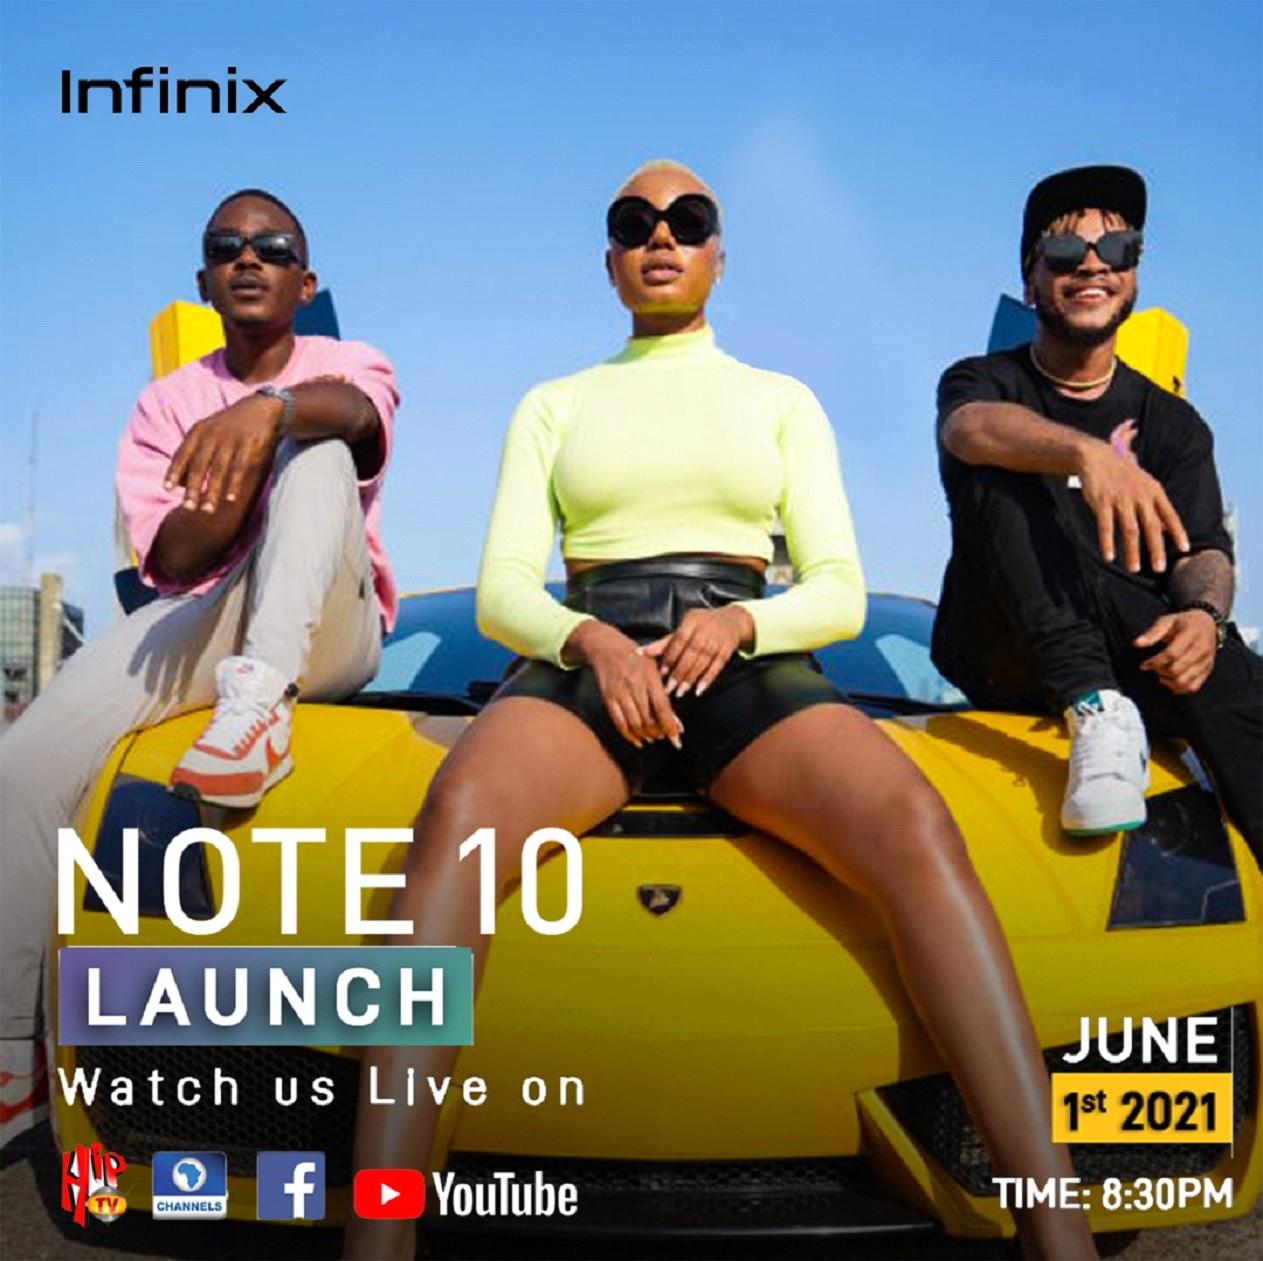 Infinix Note 10 launch